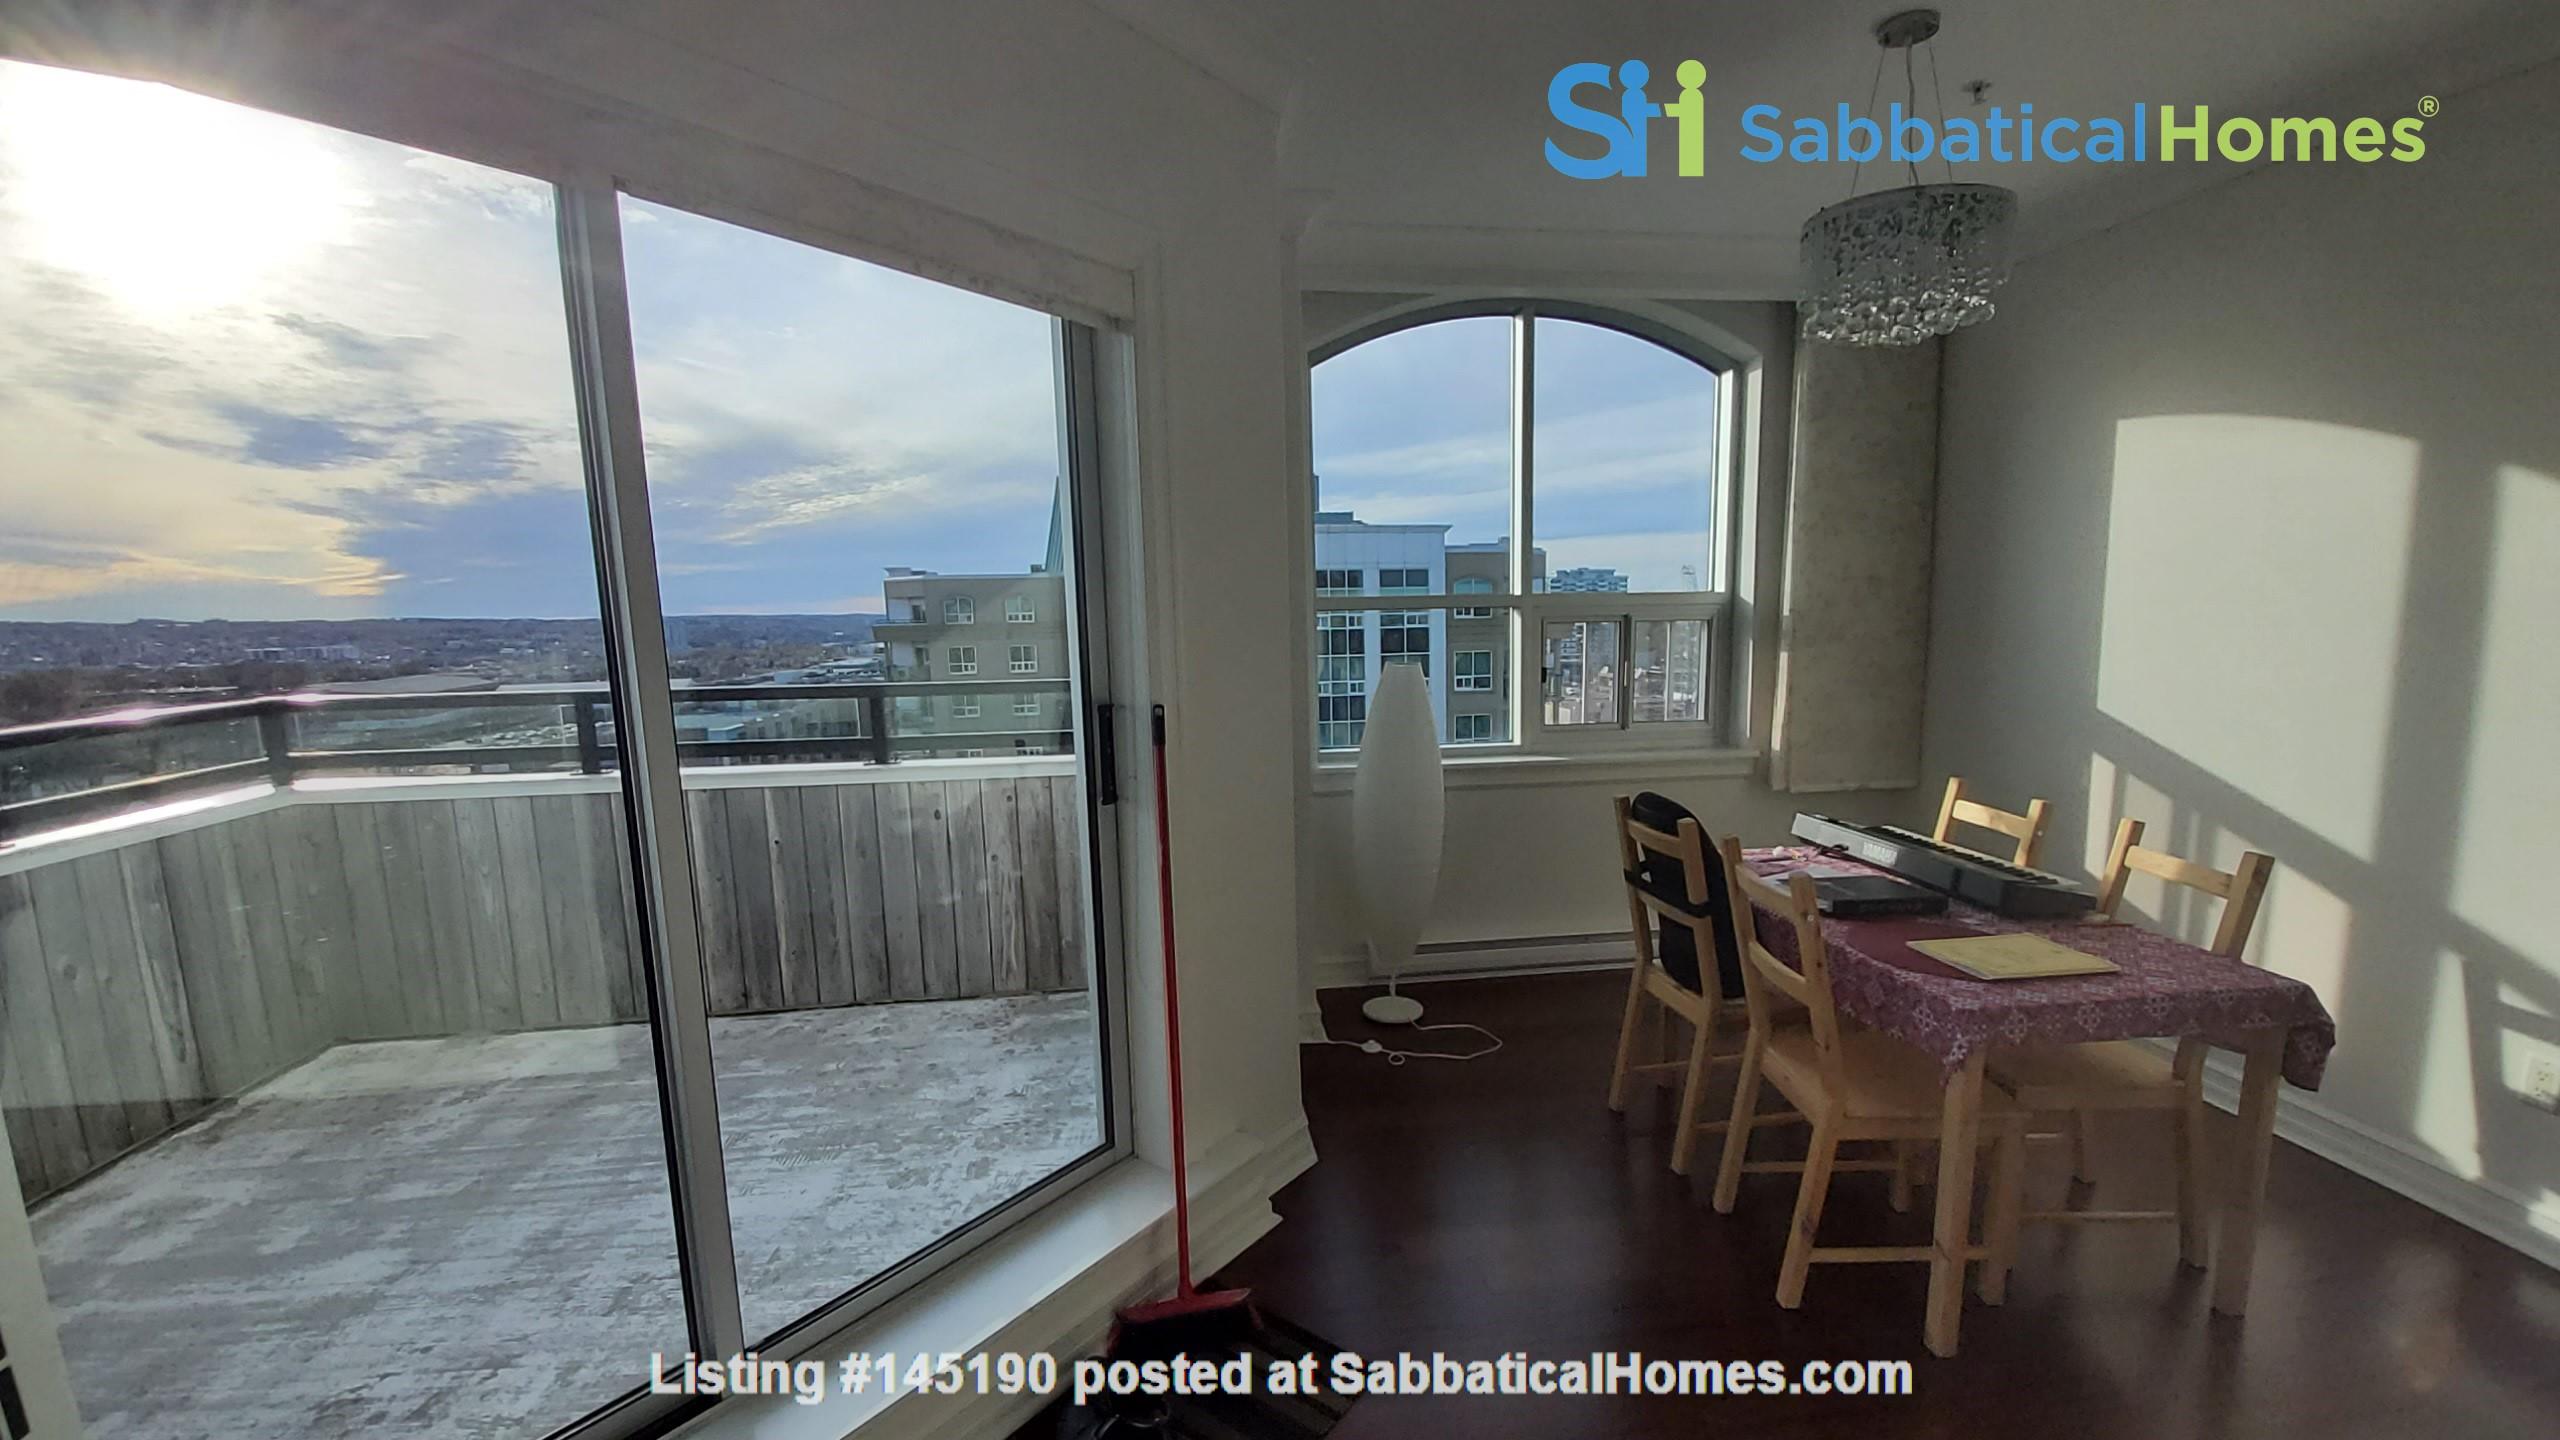 Spacious, Sunny, 12th-floor Condo in the North End of Halifax, Nova Scotia Home Rental in Halifax, Nova Scotia, Canada 2